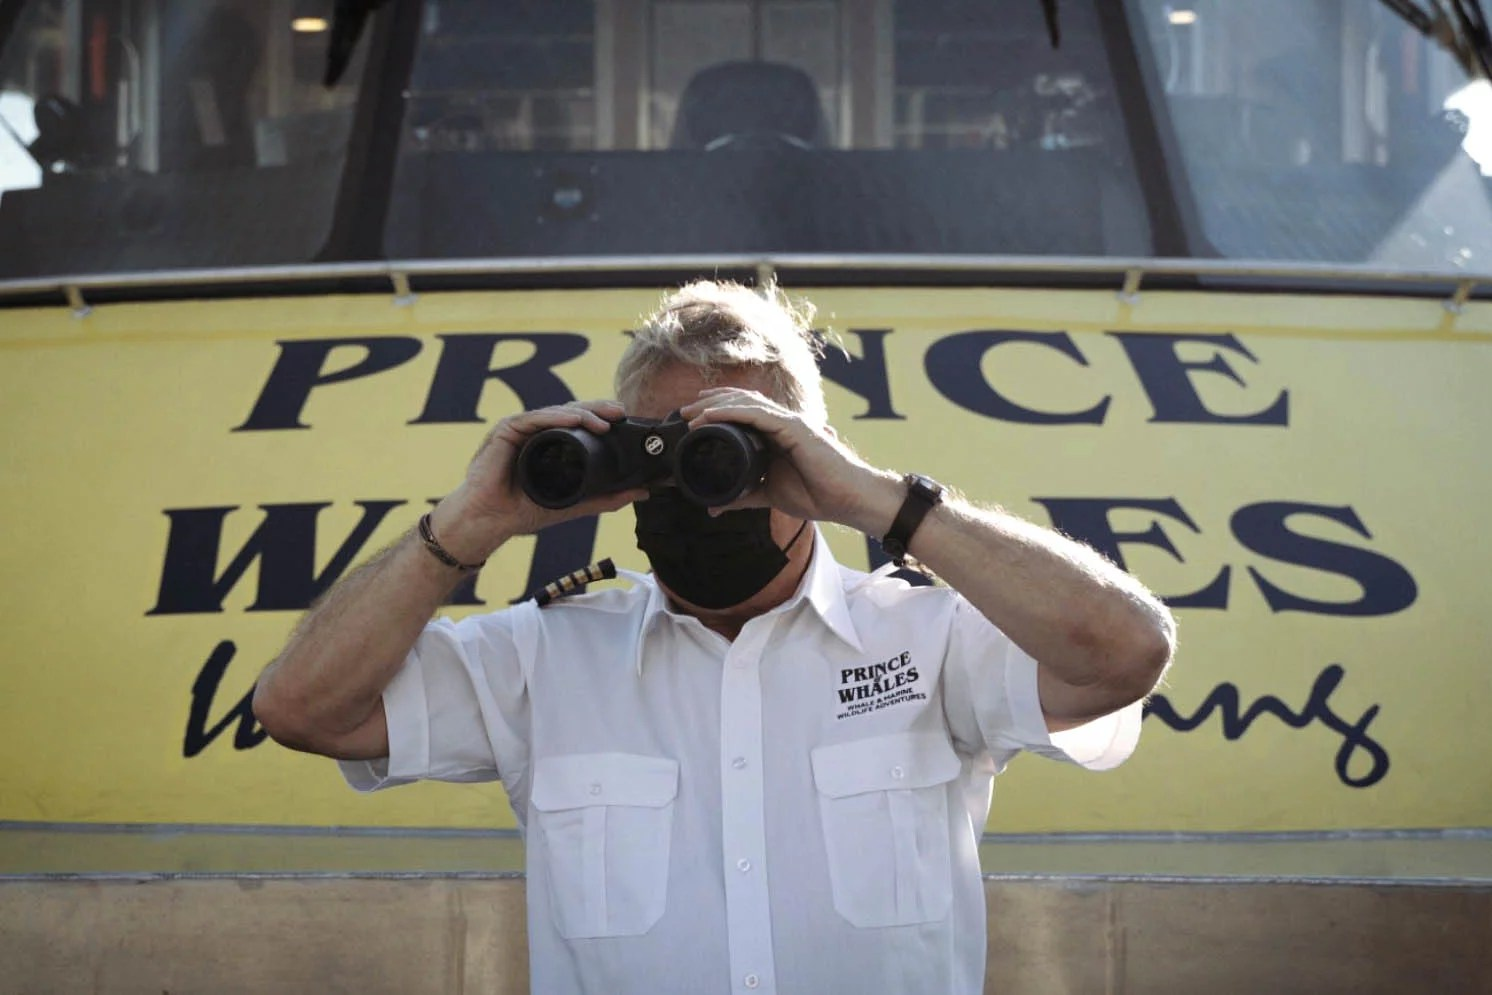 Captian looking our of binoculars